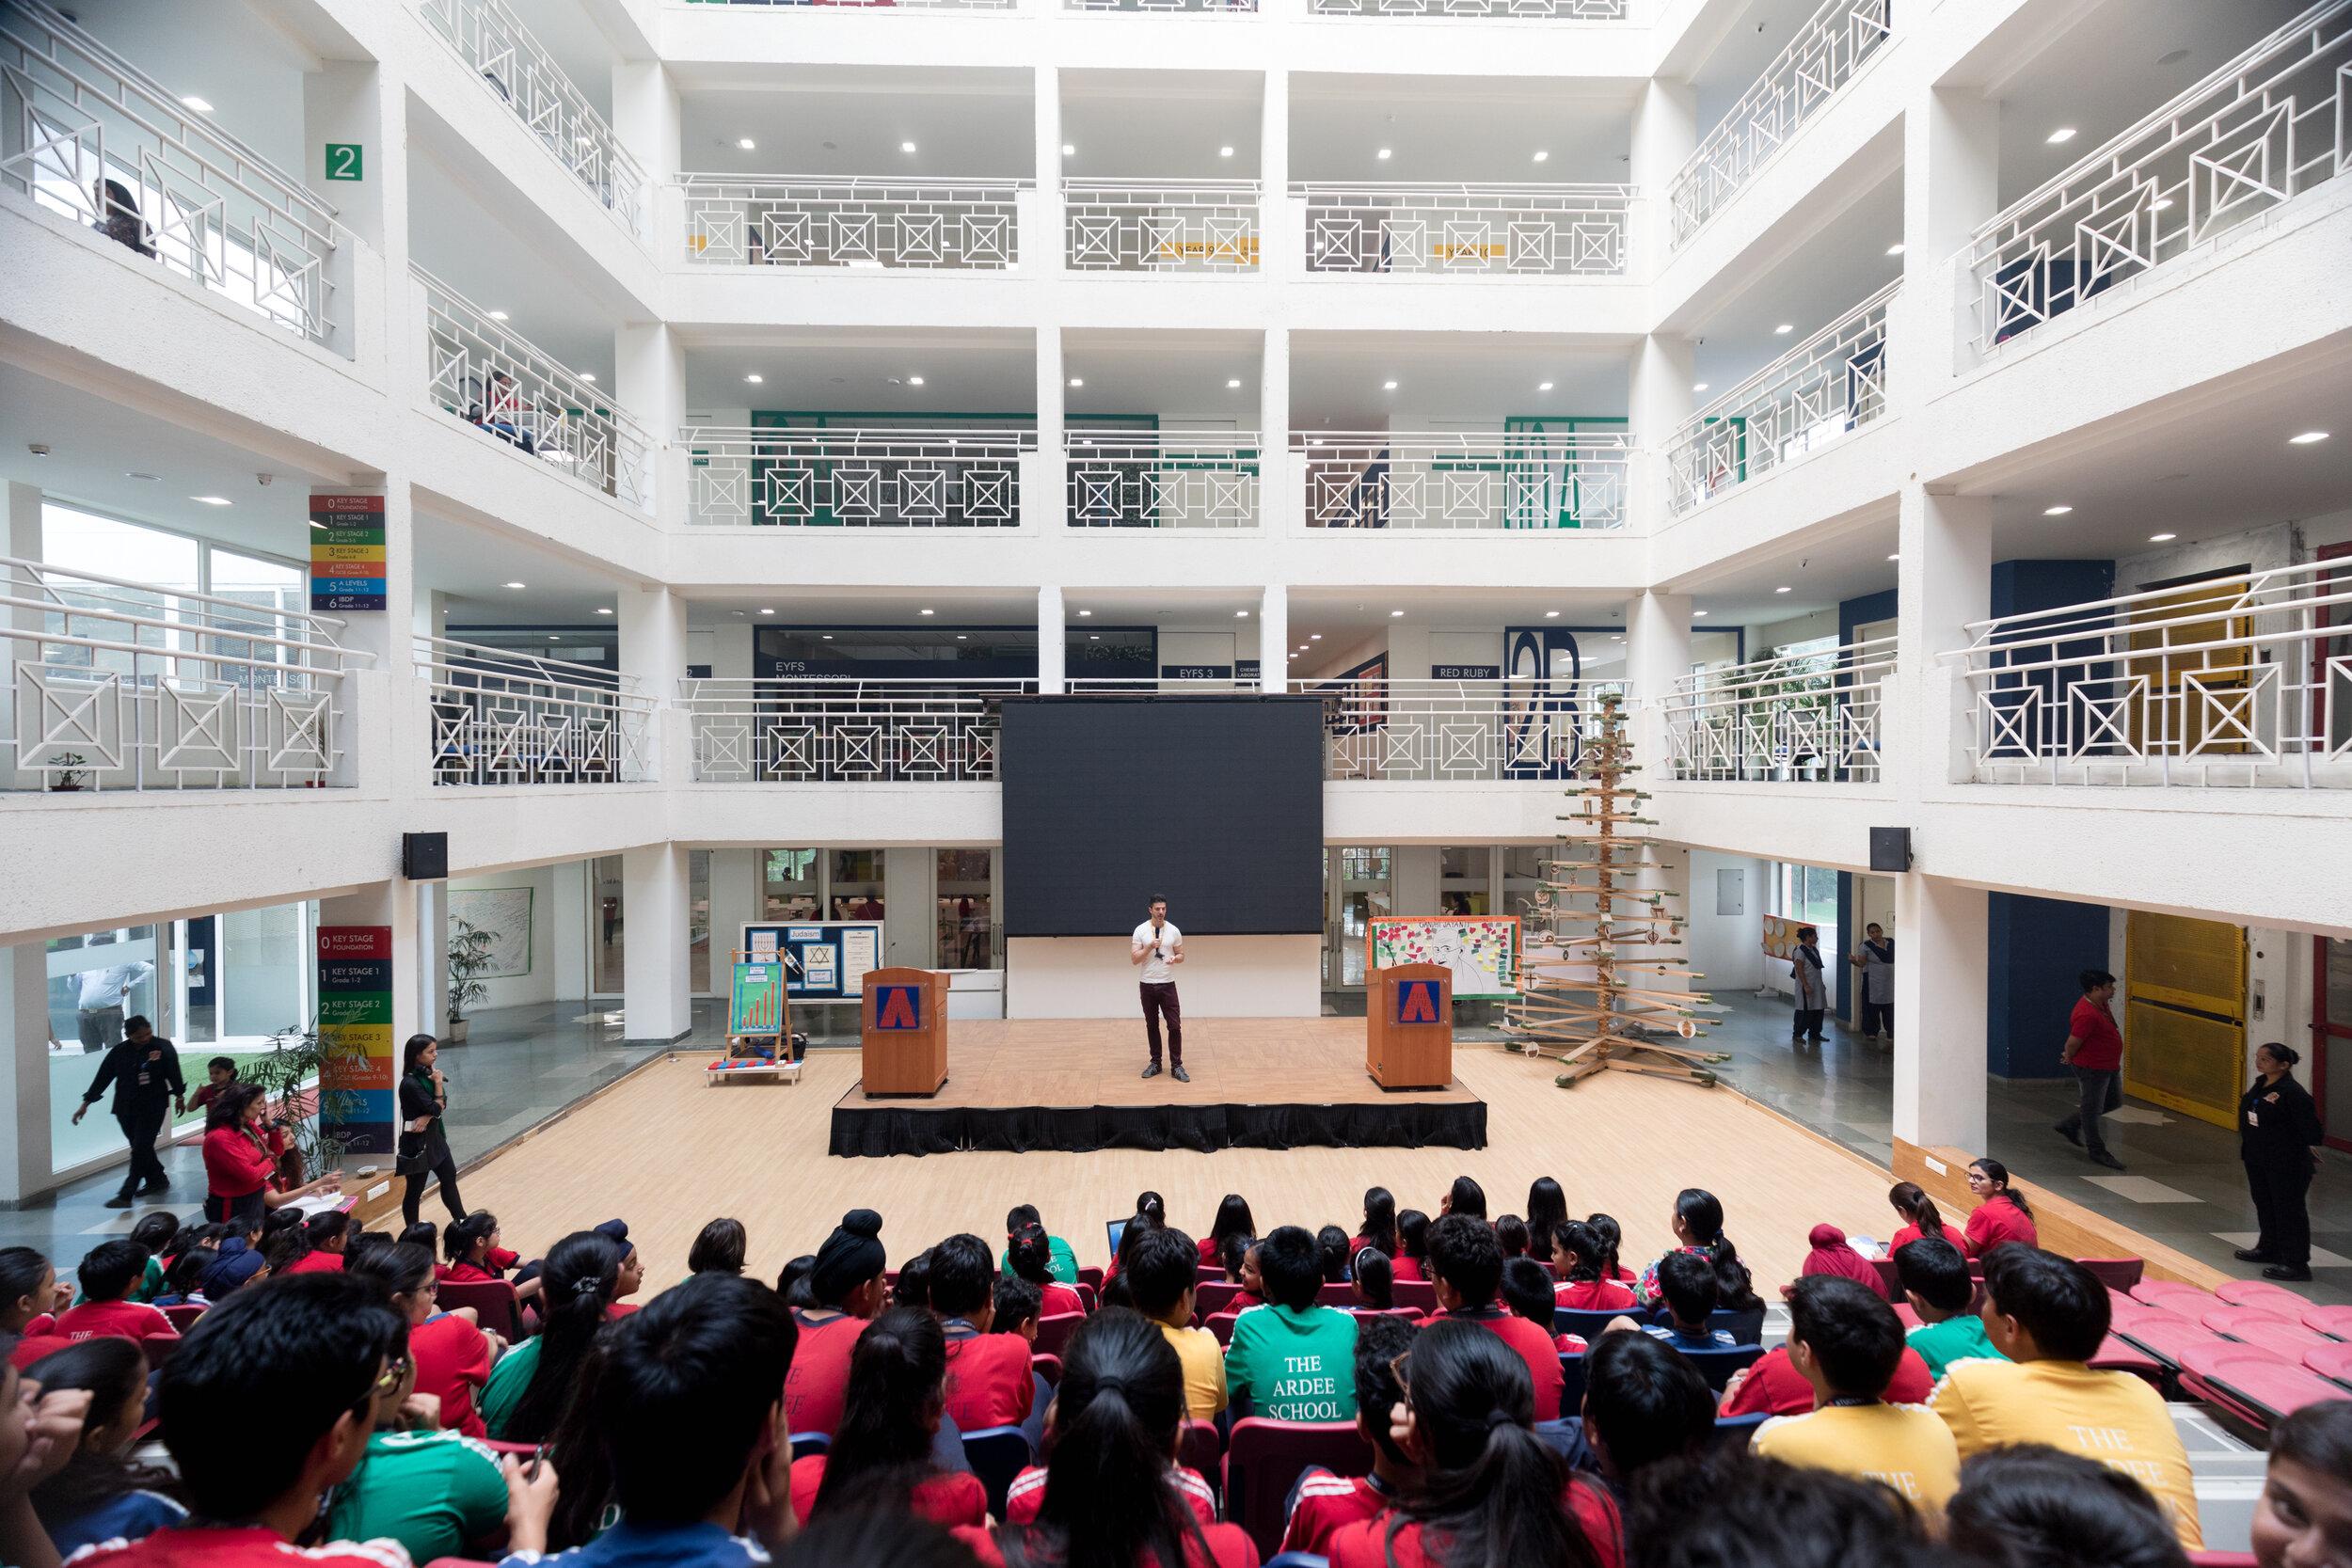 Ballet Rising director Casey Herd speaking with schoolchildren in New Delhi, India about life as a ballet dancer.